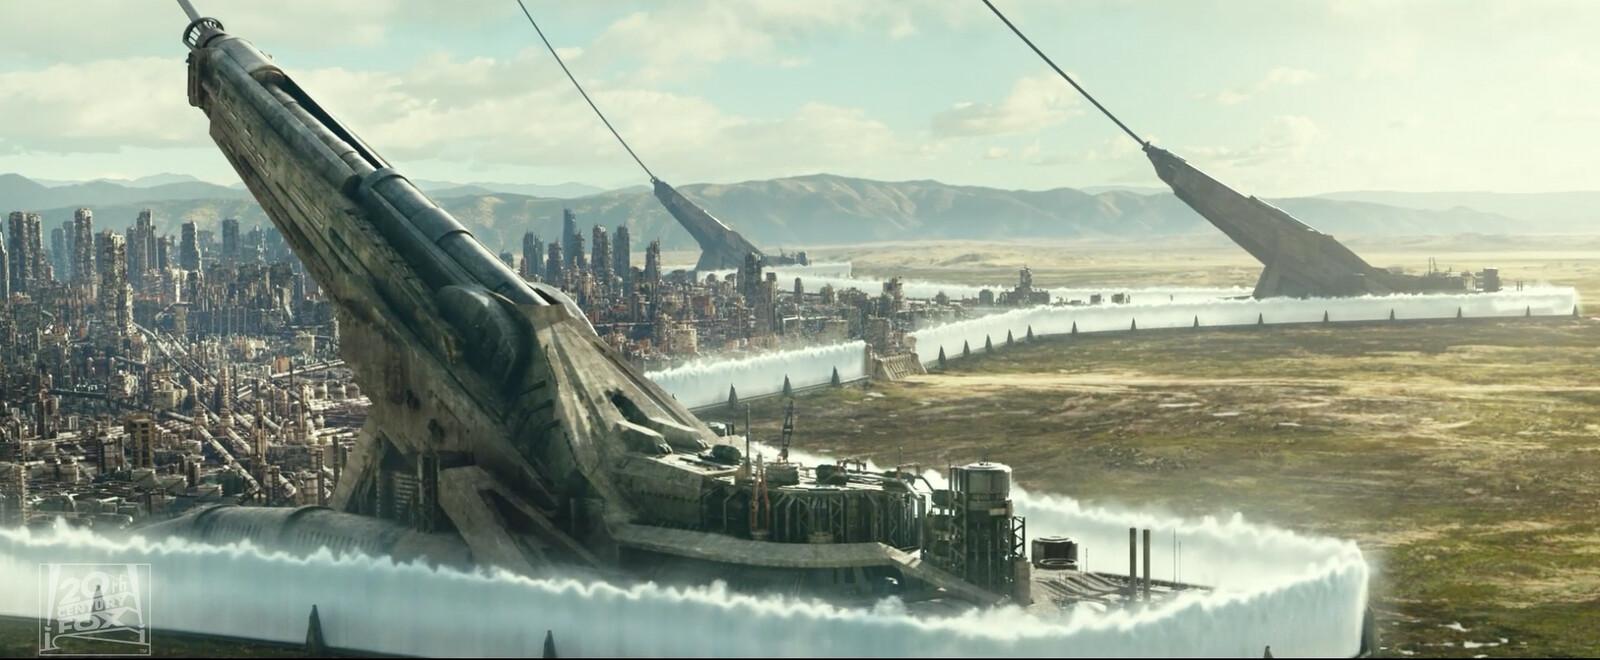 Exterior Environment: CG Ground + DMP Mountains and Sky.